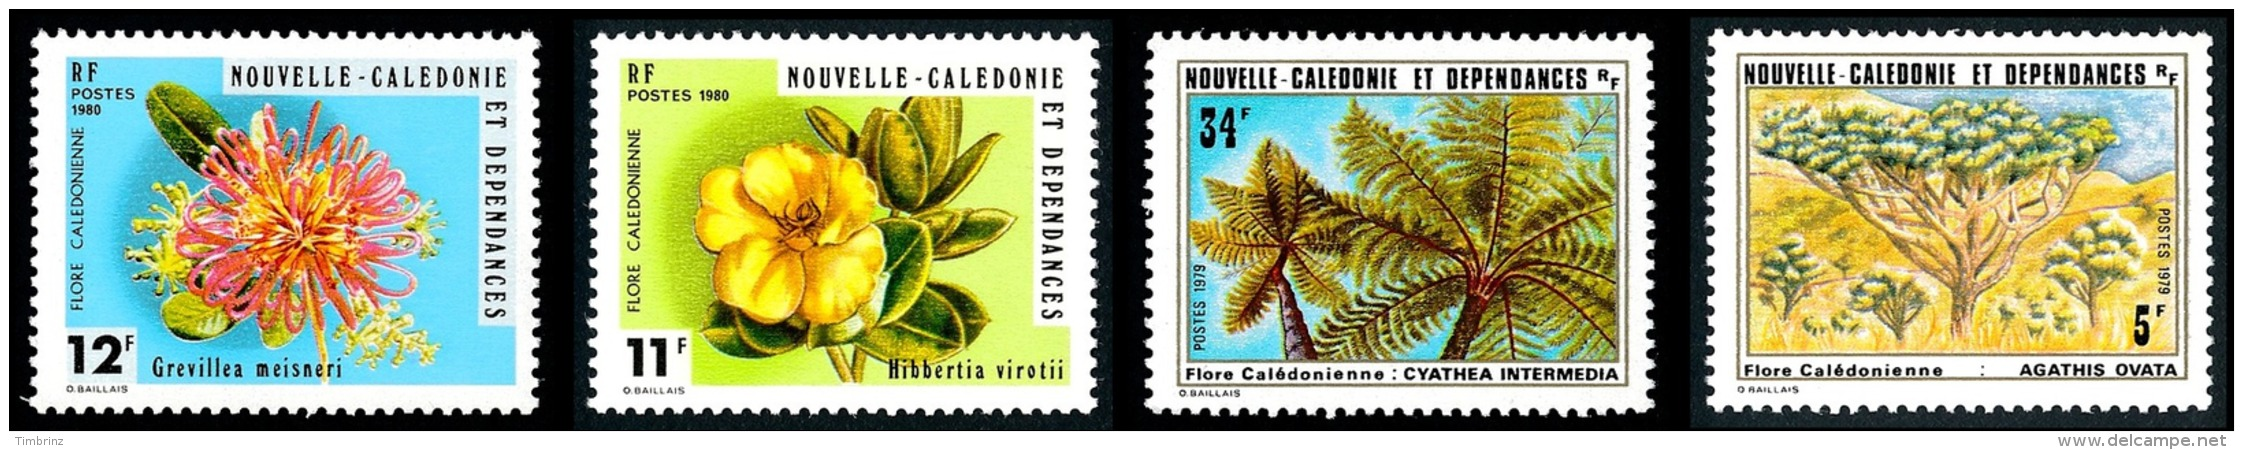 NOUV.-CALEDONIE 1979 - Yv. 431 432 436 437 **   Cote= 7,40 EUR - Flore: Aghatis, Cyathea, ... (4 Val.)  ..Réf.NCE23856 - Ungebraucht